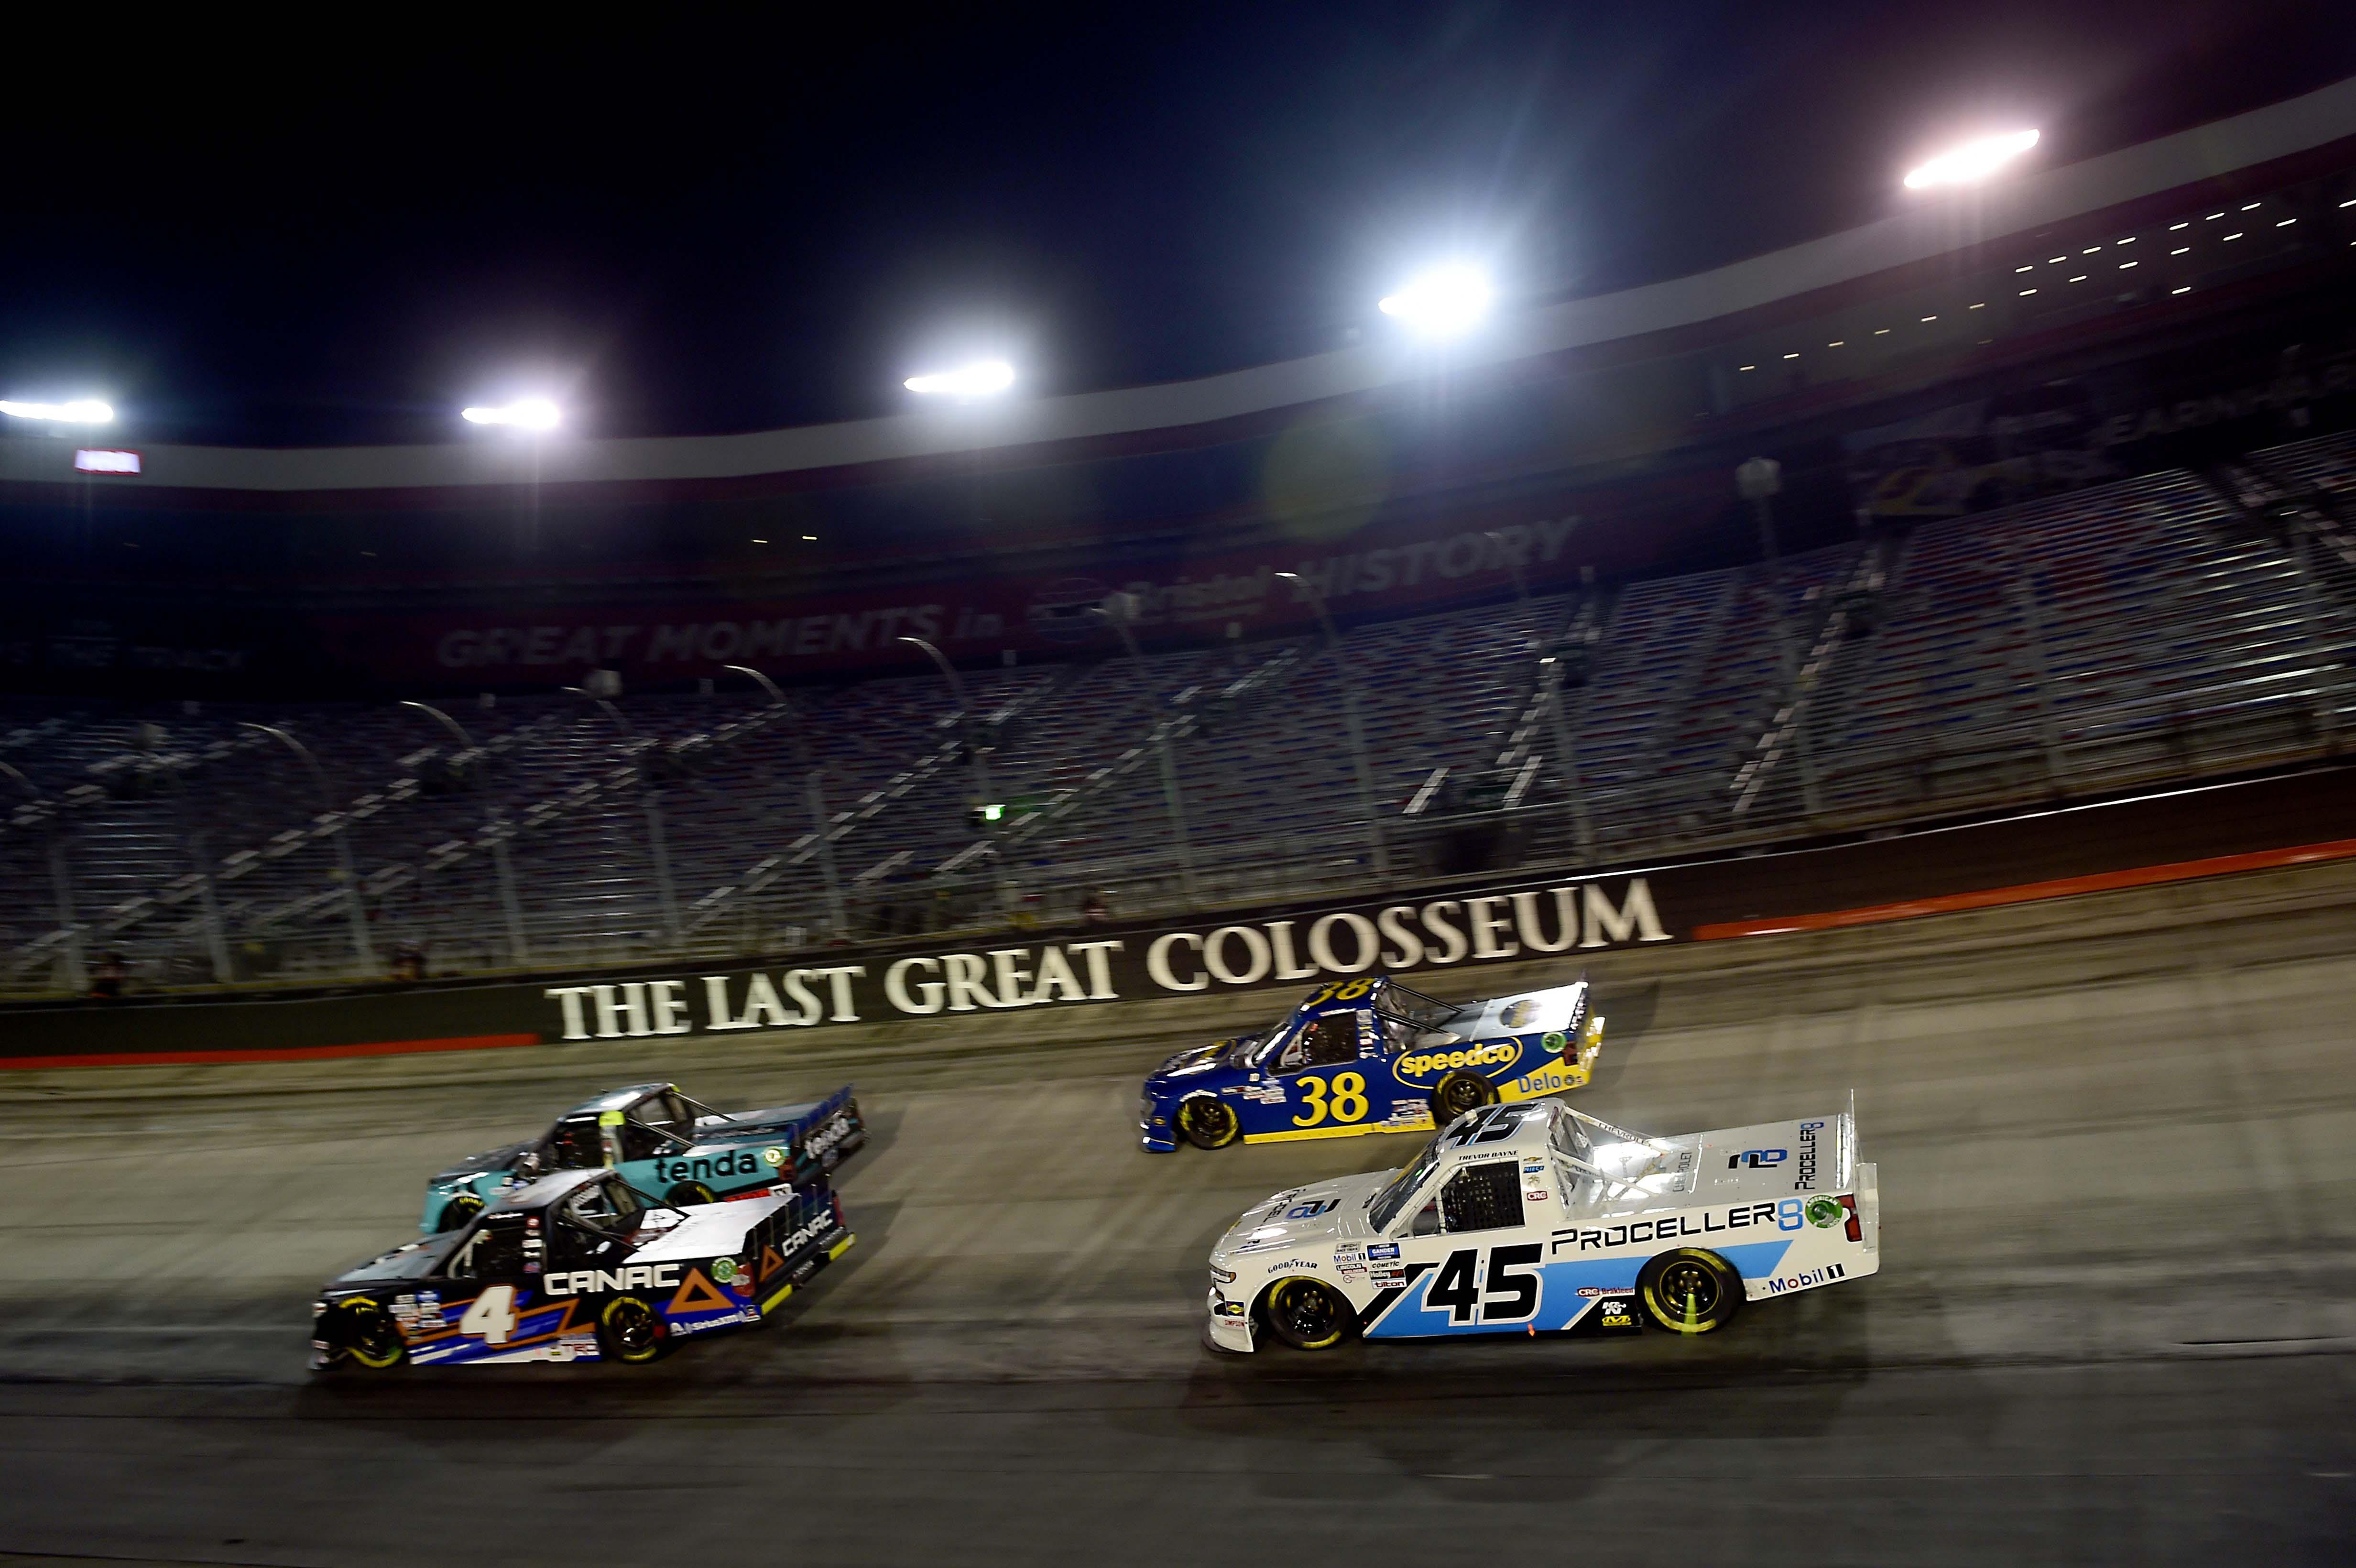 Trevor Bayne disqualified by NASCAR after Bristol Motor Speedway - Racing News